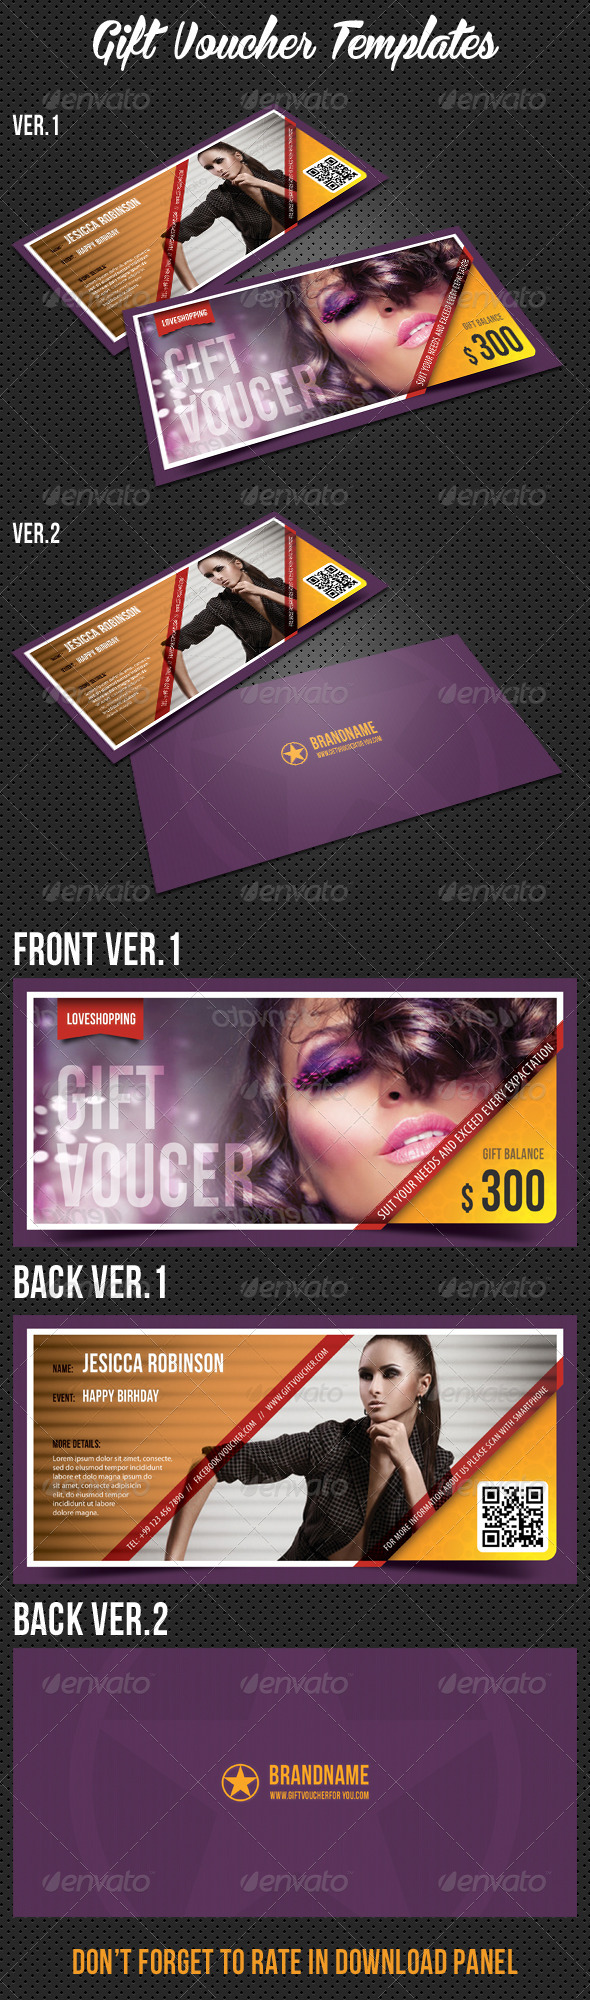 GraphicRiver Gift Voucher V01 7688061